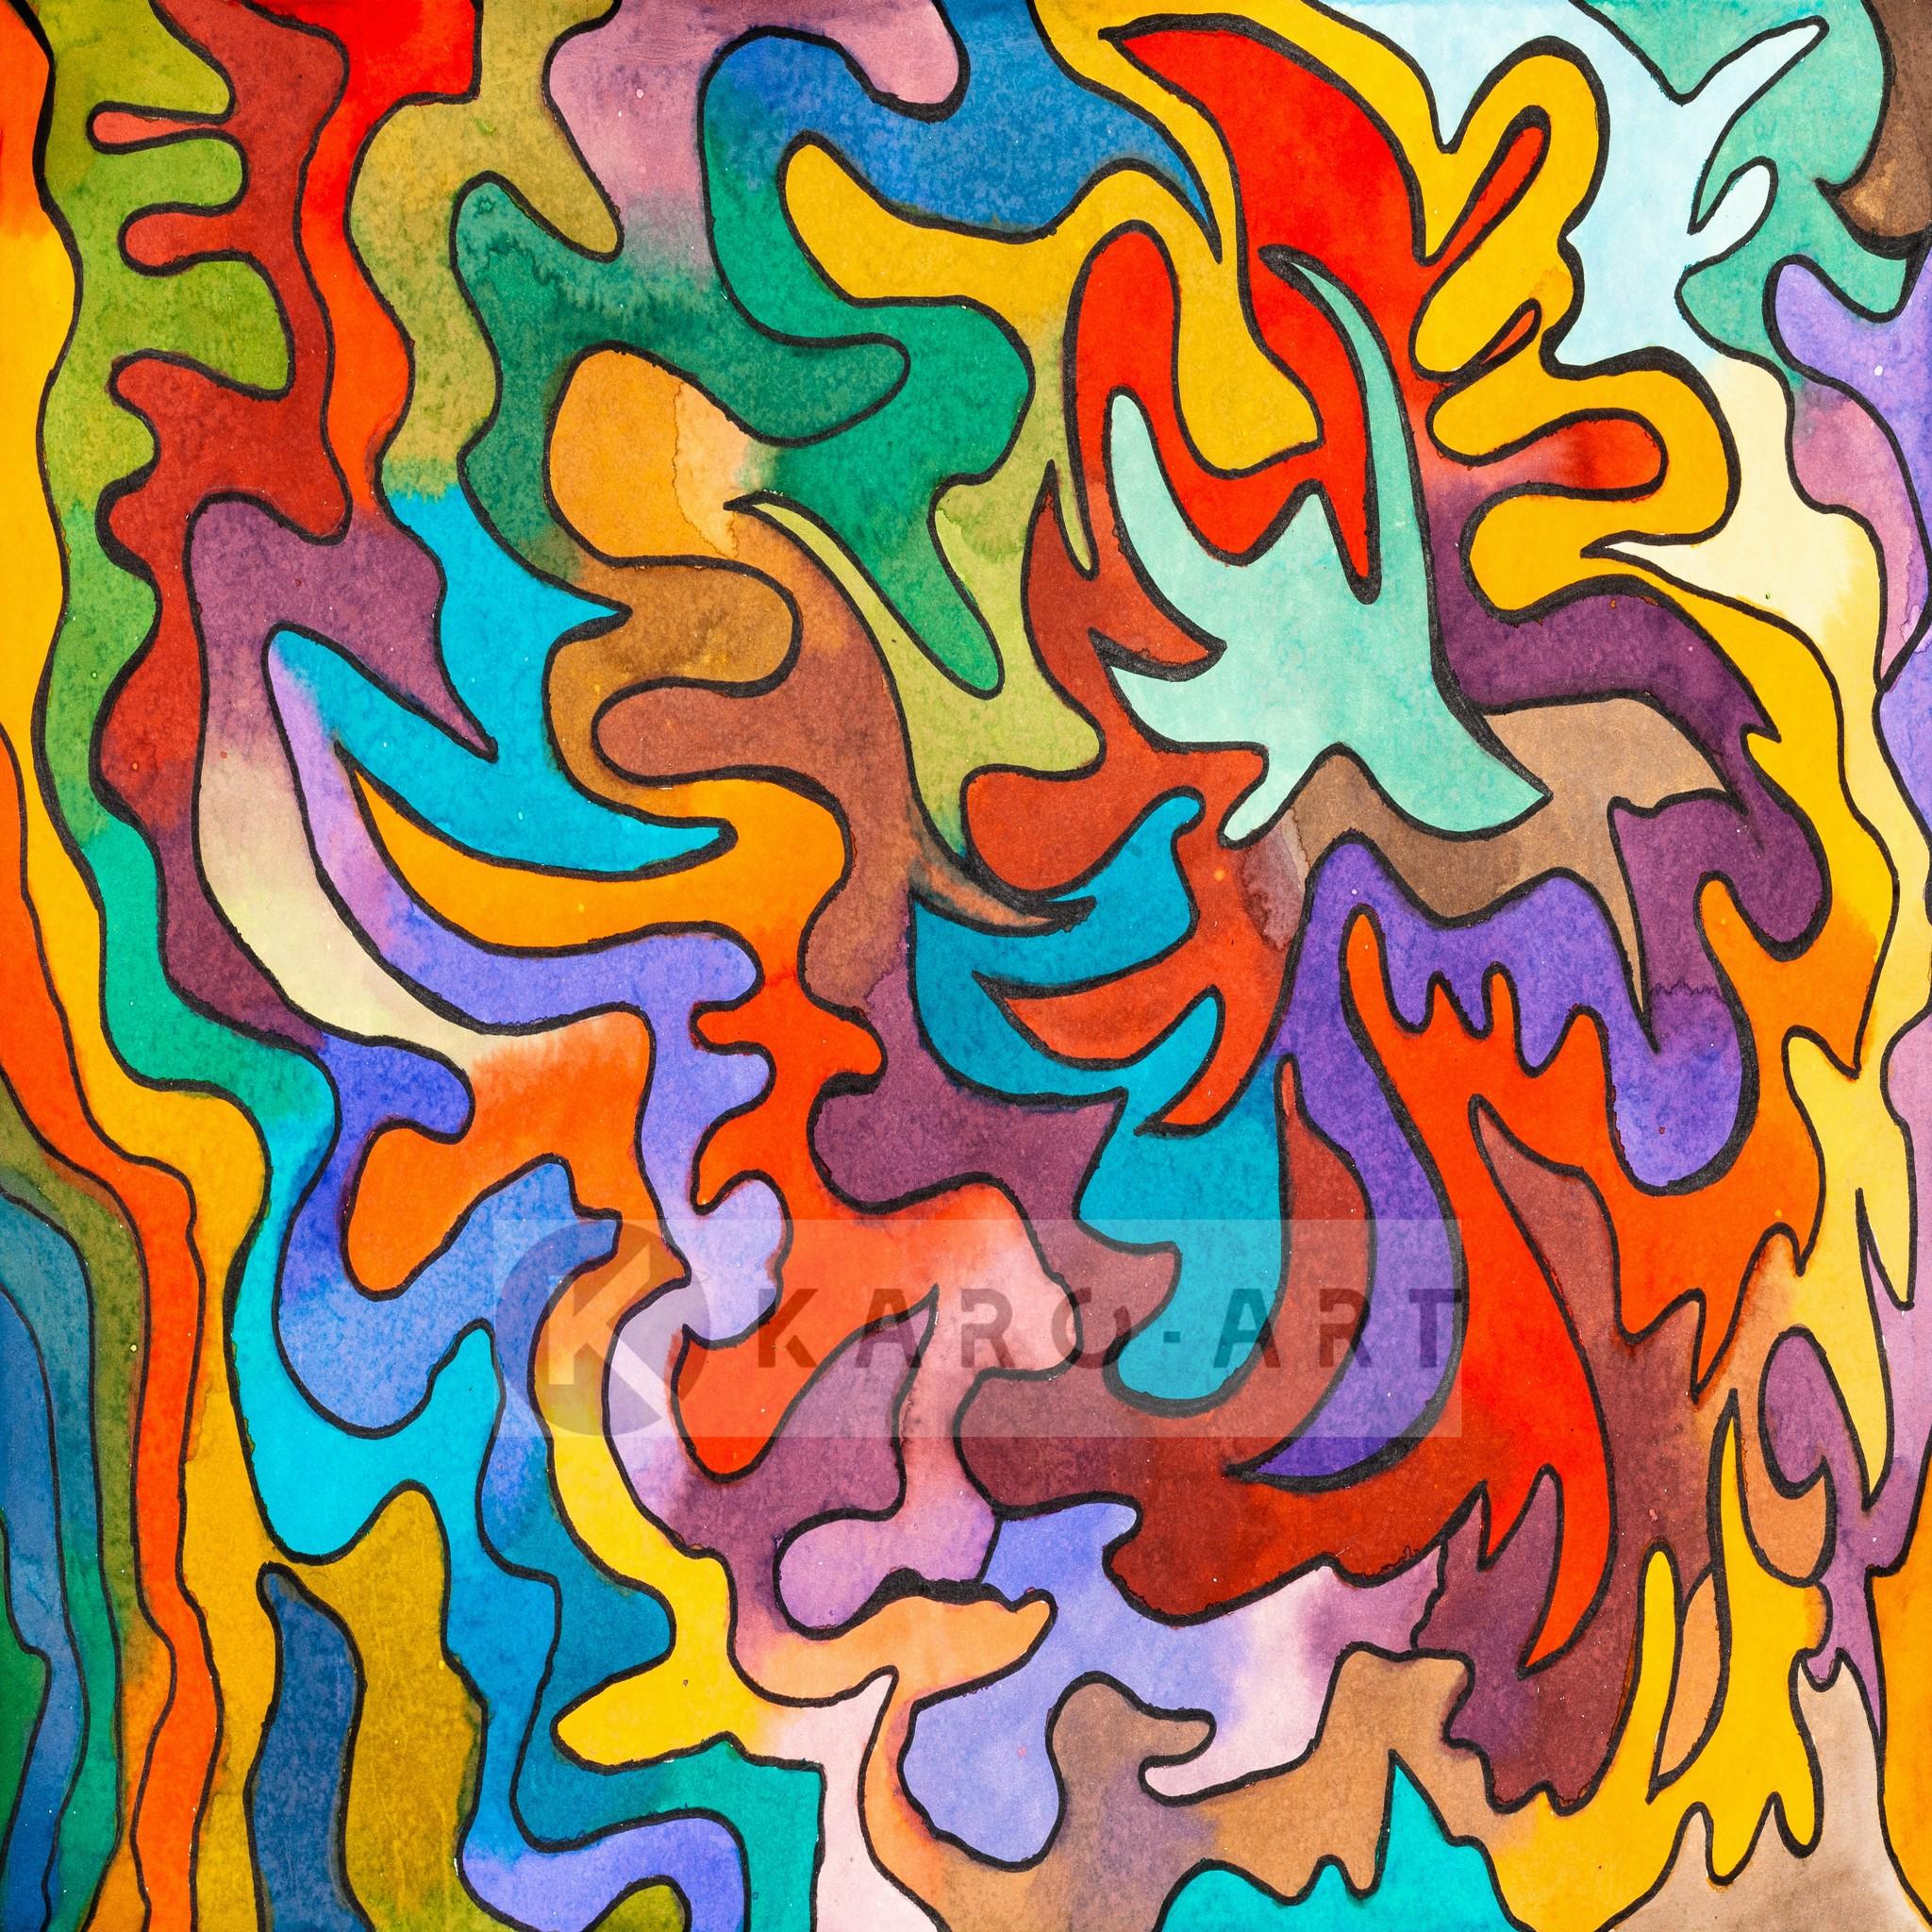 Afbeelding op acrylglas - Abstract Aquarel, print op canvas